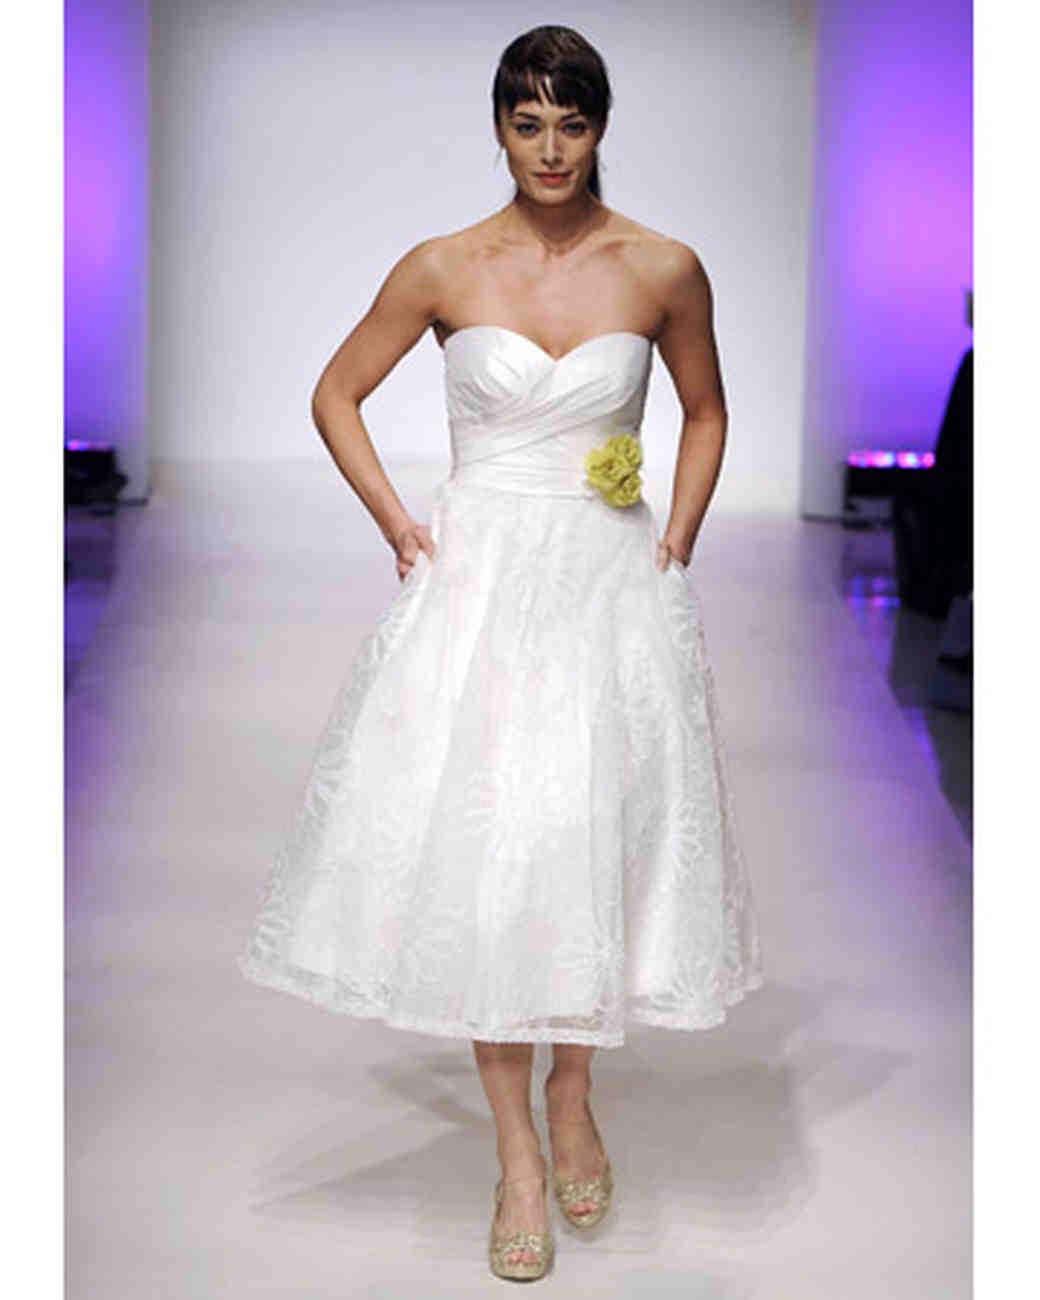 Short wedding dresses from spring 2012 bridal fashion week for Short spring wedding dresses